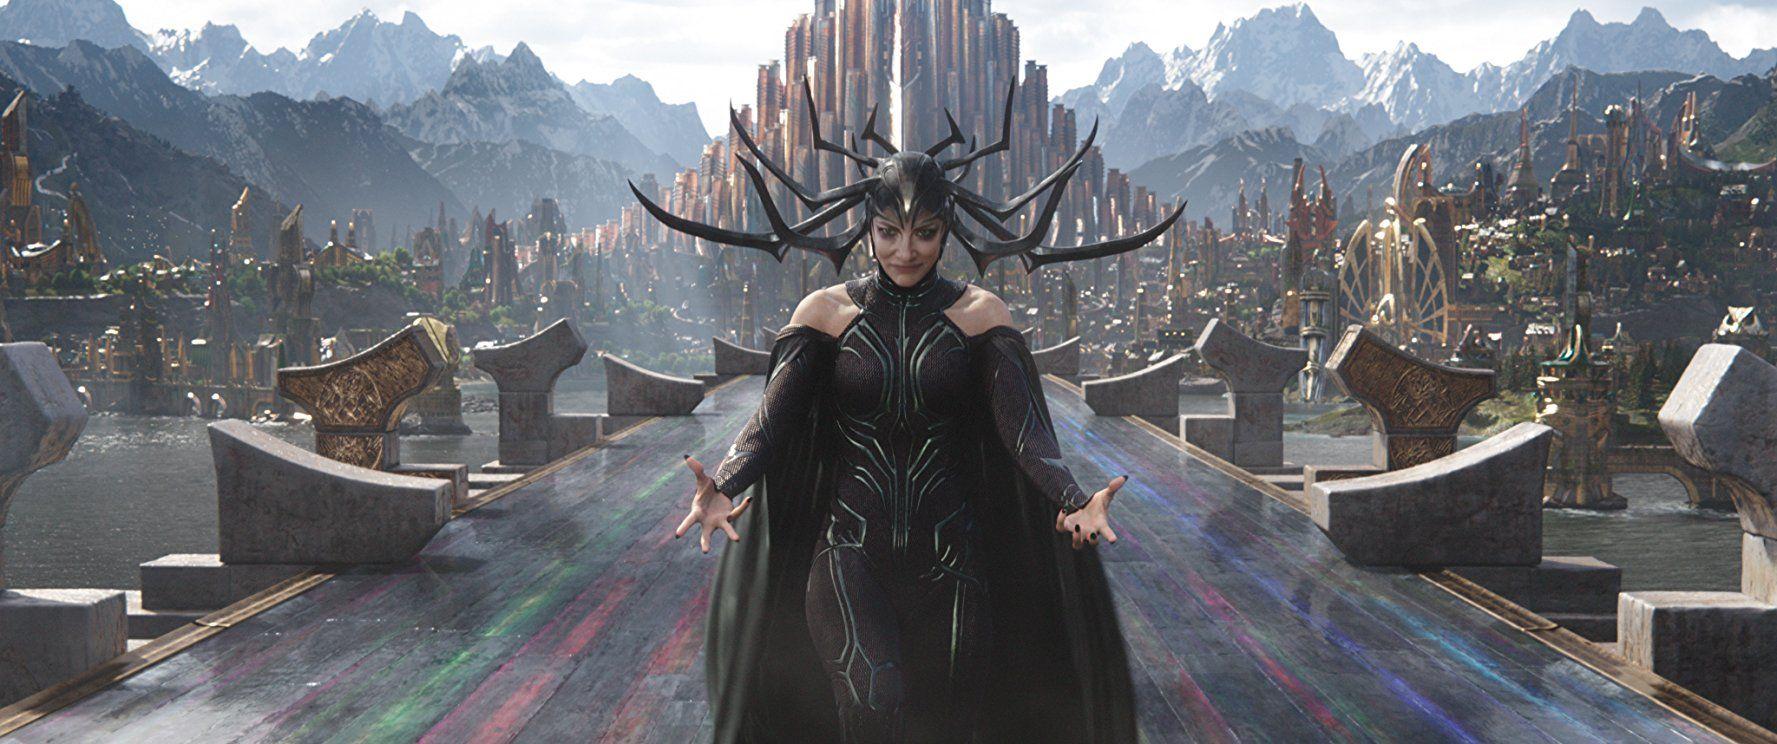 Thor Ragnarok Pelicula Completa Marvel Female Villains Ragnarok Movie Marvel Villains